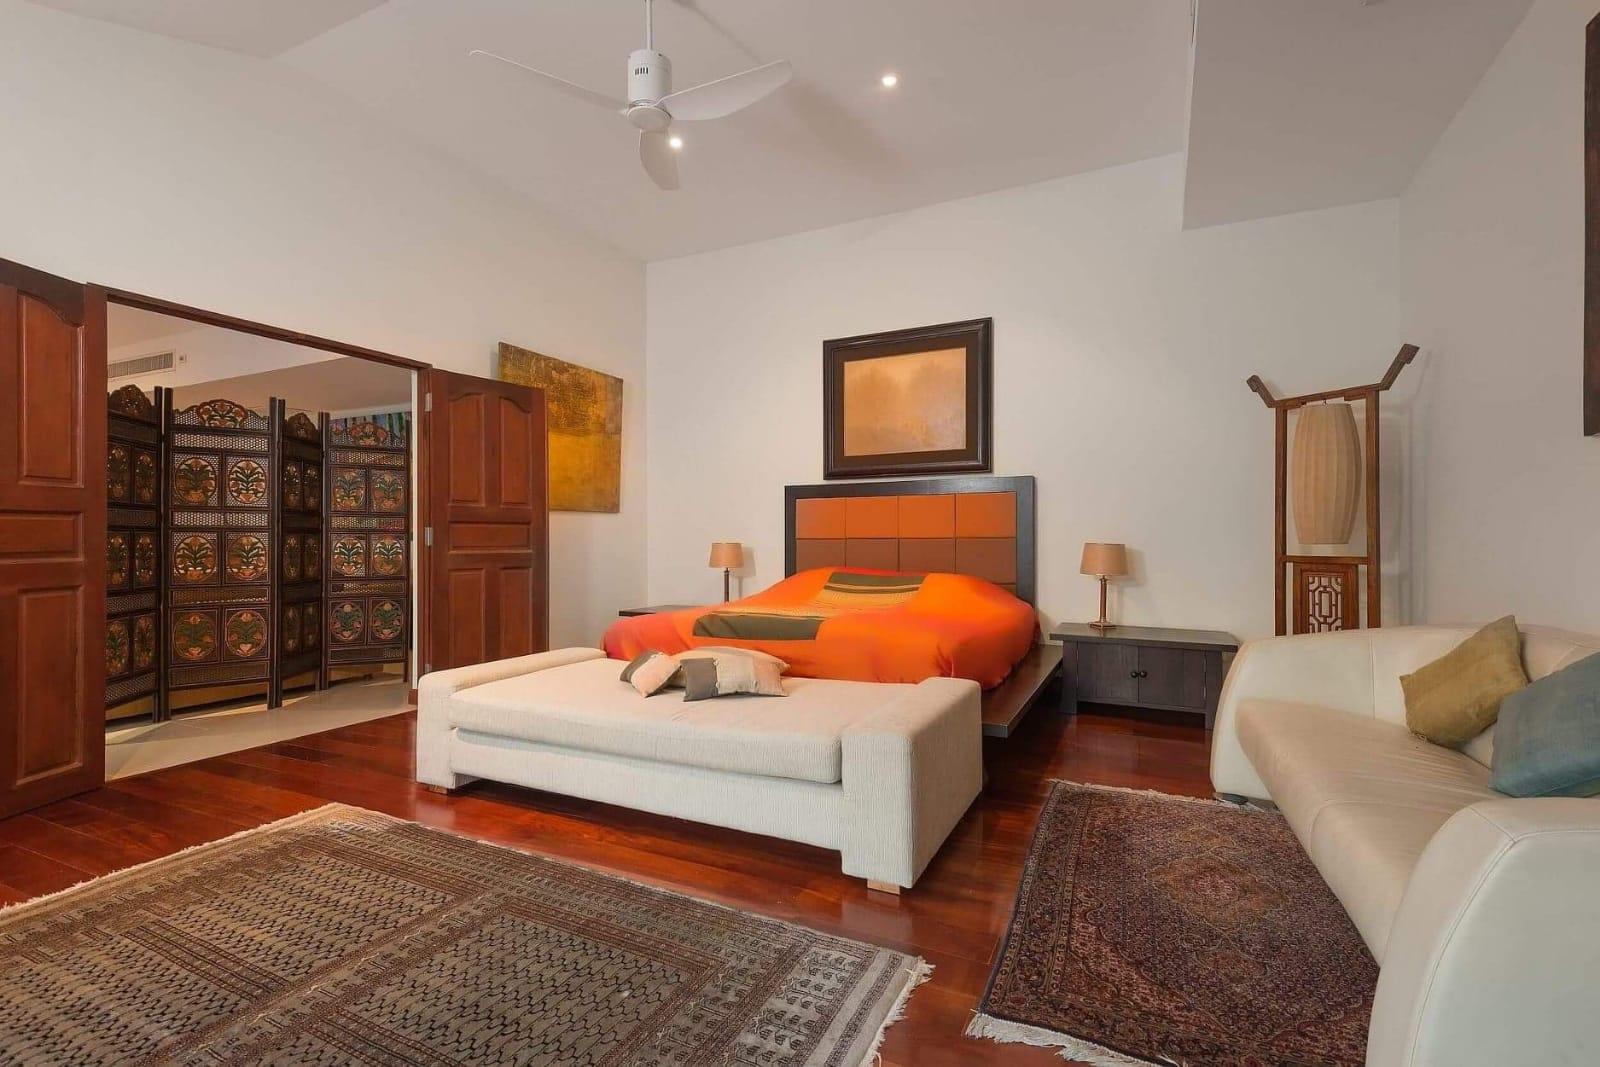 Loch Palm Courtyard 5 Bedrooms-b042ca86-0137-457e-9a9c-4dc91c6d5f38.jpg